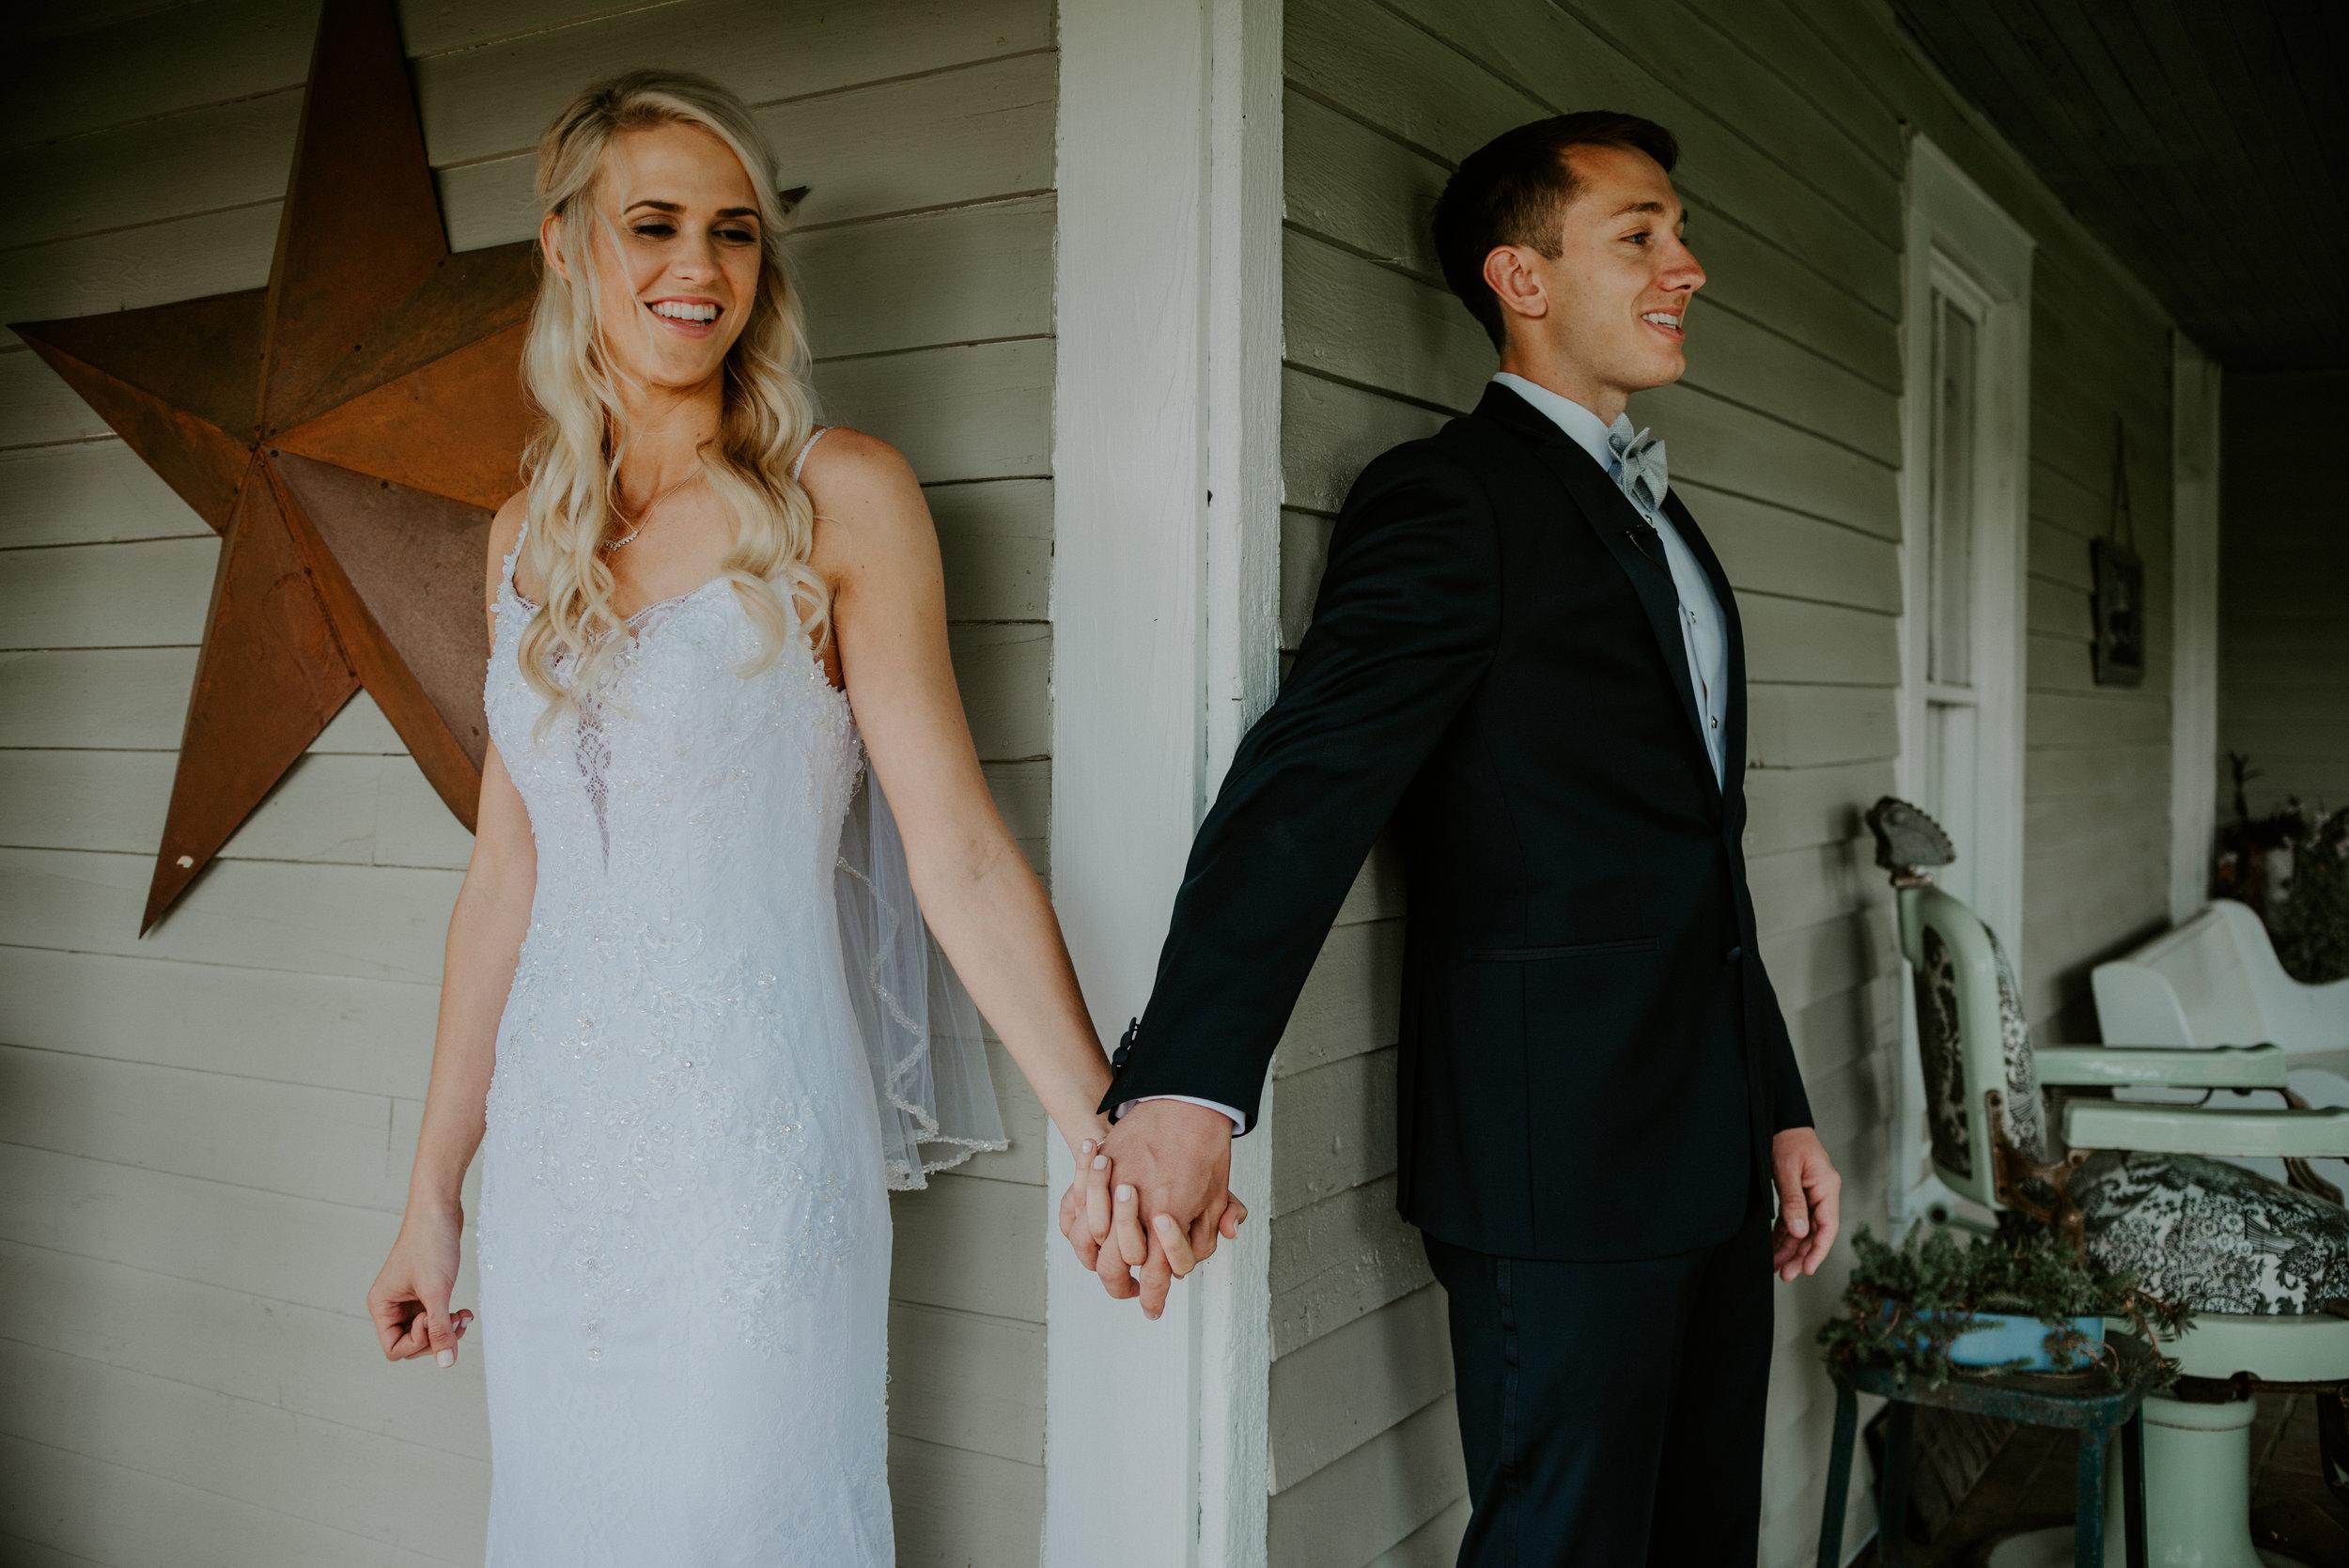 WonderlyCreative_Wedding_4.28.18_Lauren&Josh_-183.jpg